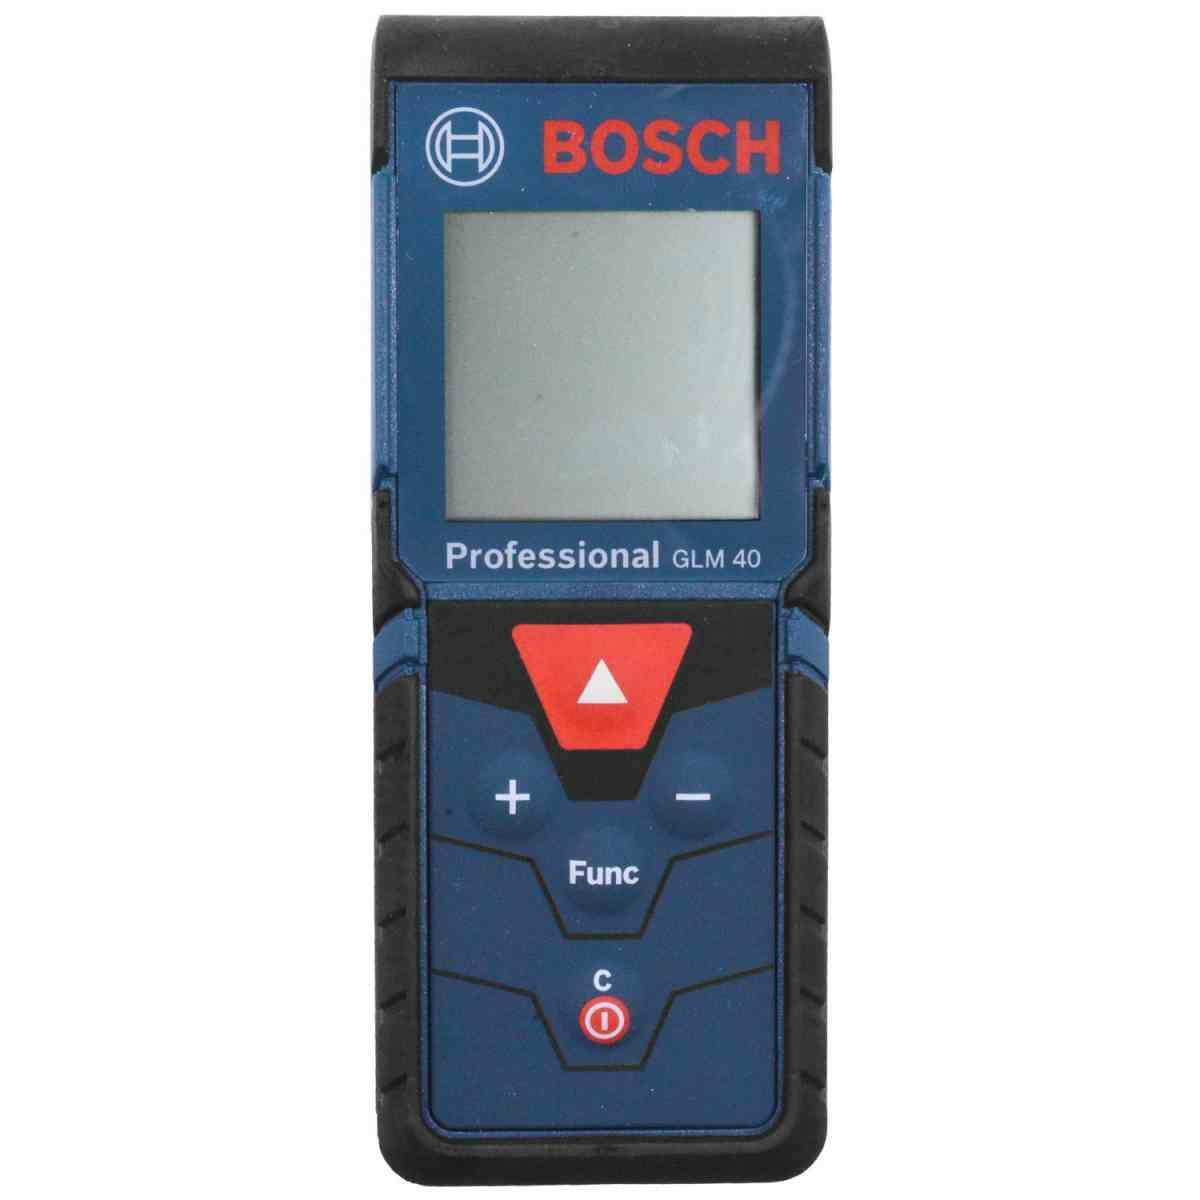 Trena À Laser Digital para Medições 0,15 À 40 M Glm40 Bosch